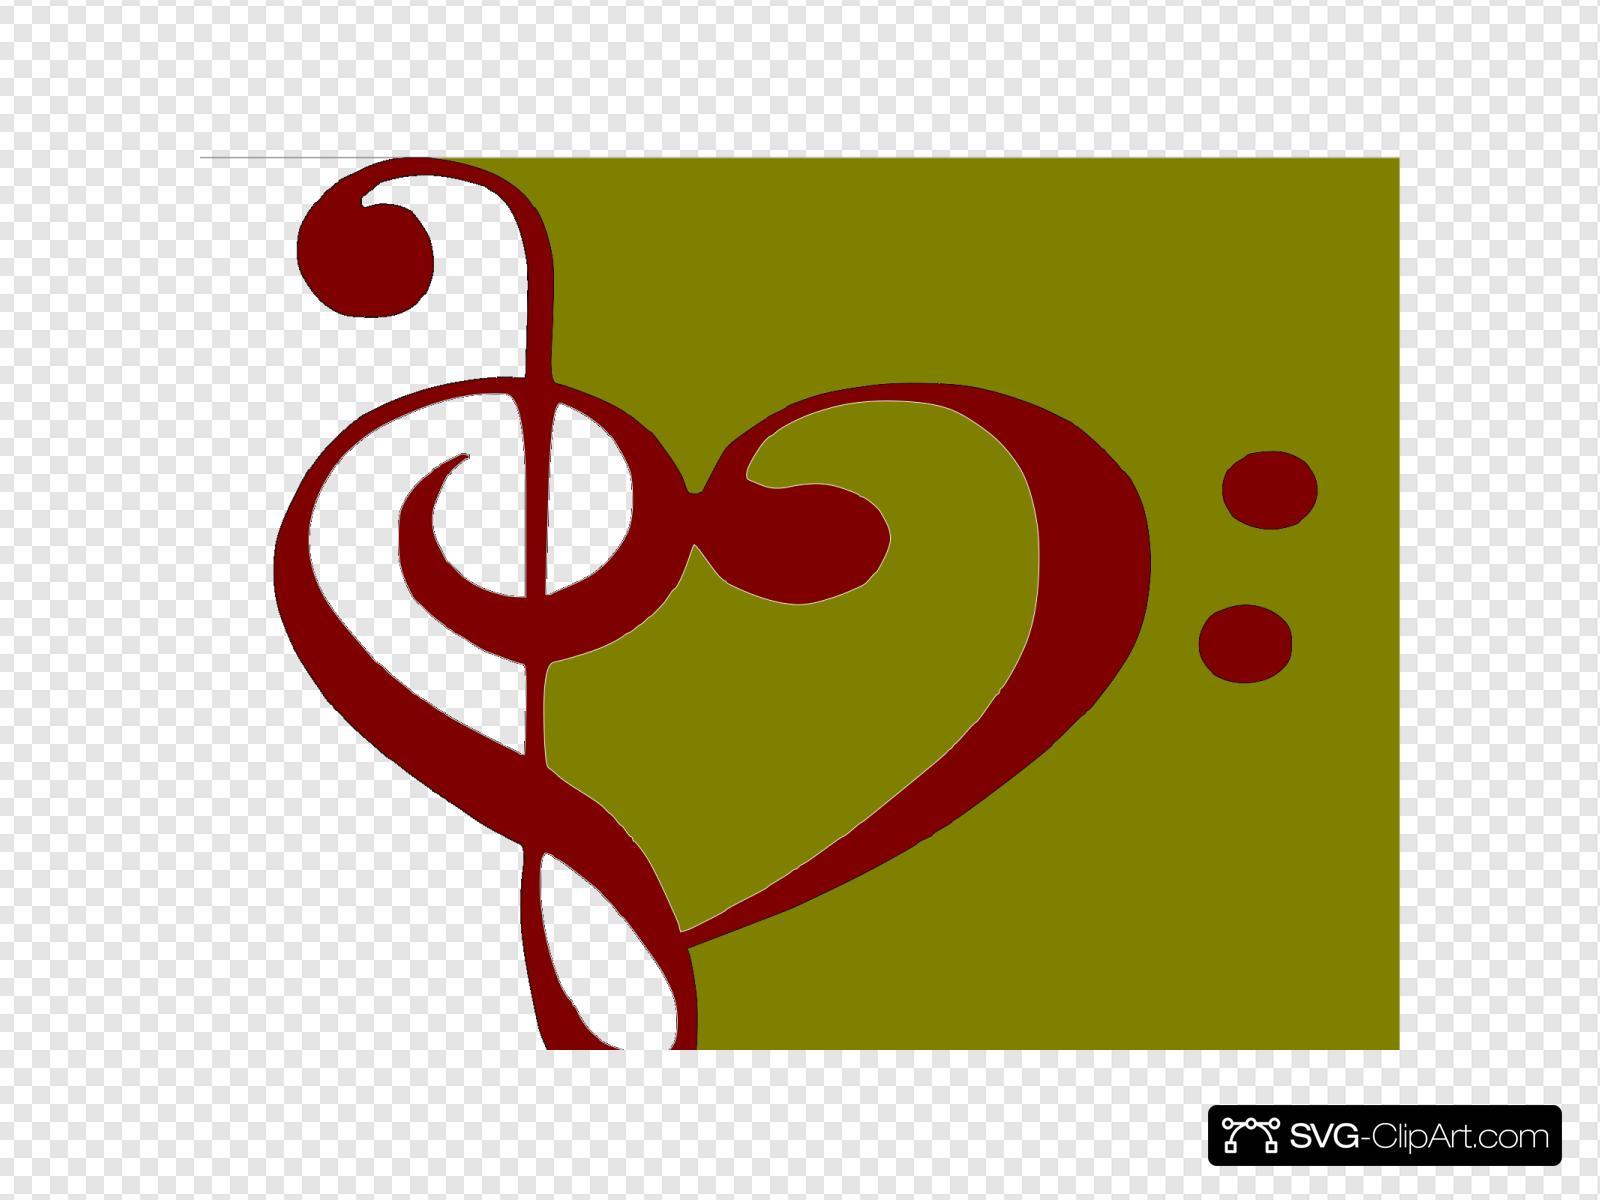 Bass Clef Treble Clef | Treble clef tattoo, Music tattoos, Treble clef heart